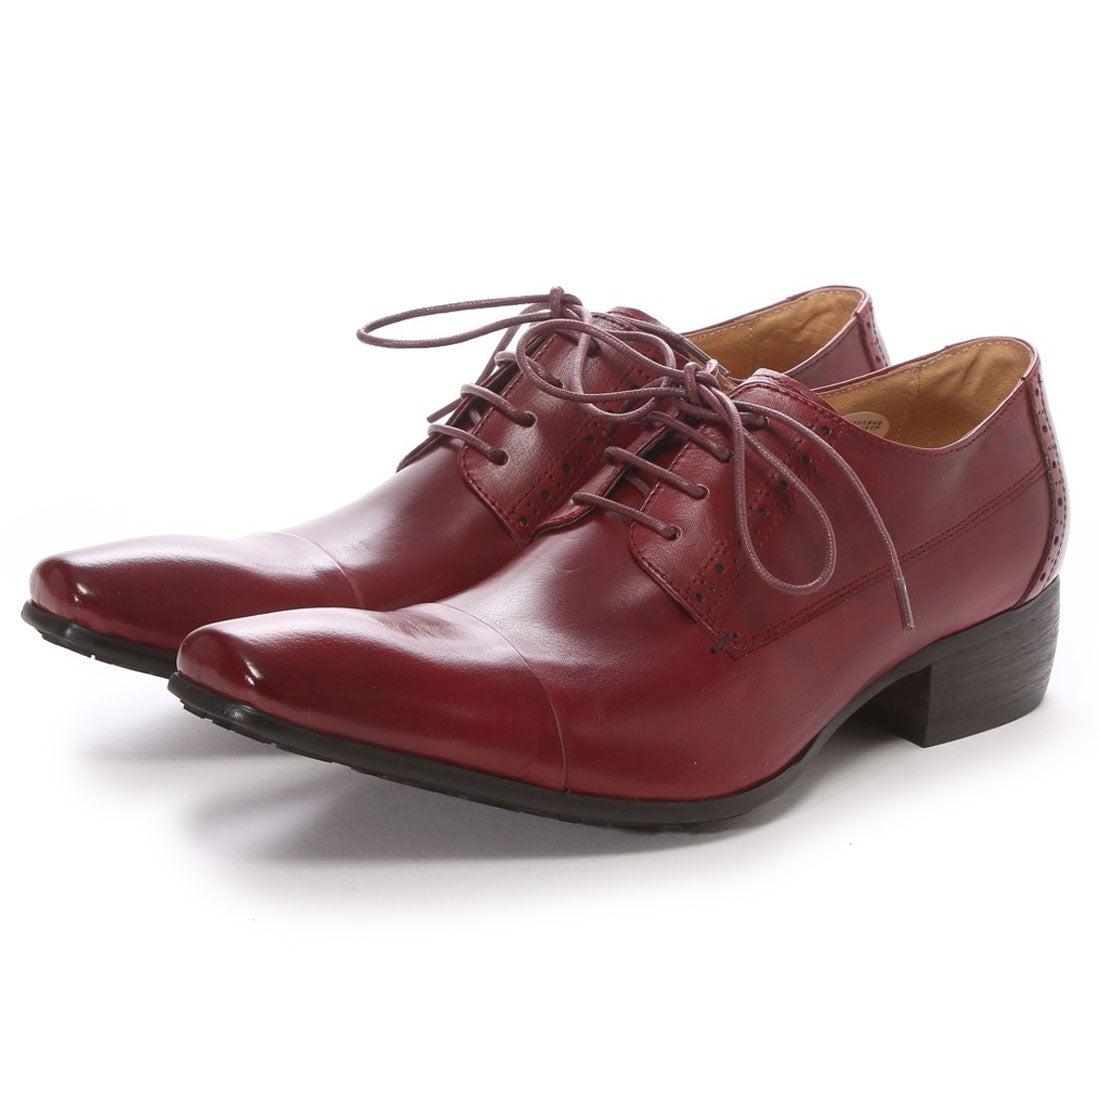 SFW サラバンド SARABANDE バッファローレザー上向きラストビジネスシューズ(外羽根ストレートチップ)(ワイン) -靴&ファッション通販 ロコンド〜自宅で試着、気軽に返品